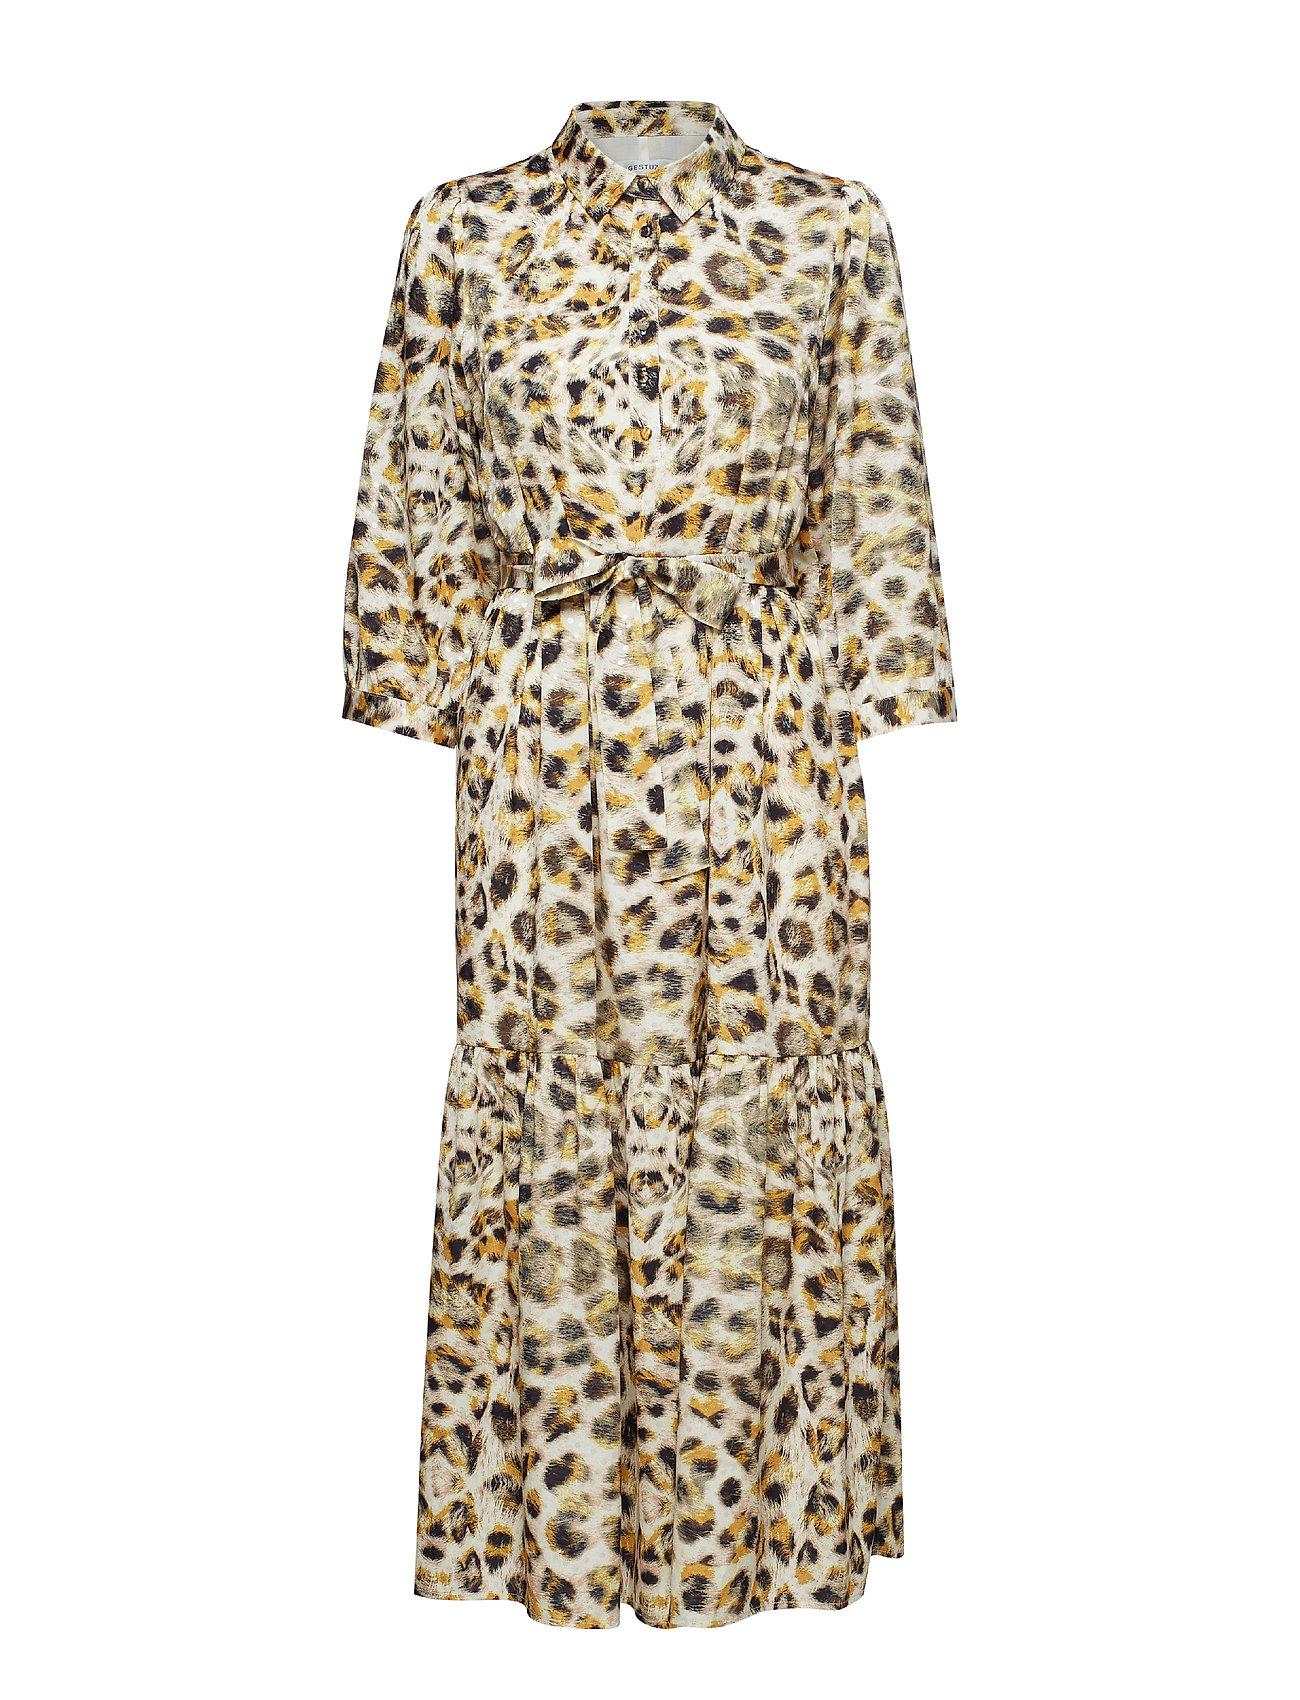 Oz AnimalGestuz Dress Ze1 19yellow Tjekkegz ZuwPkXTOi